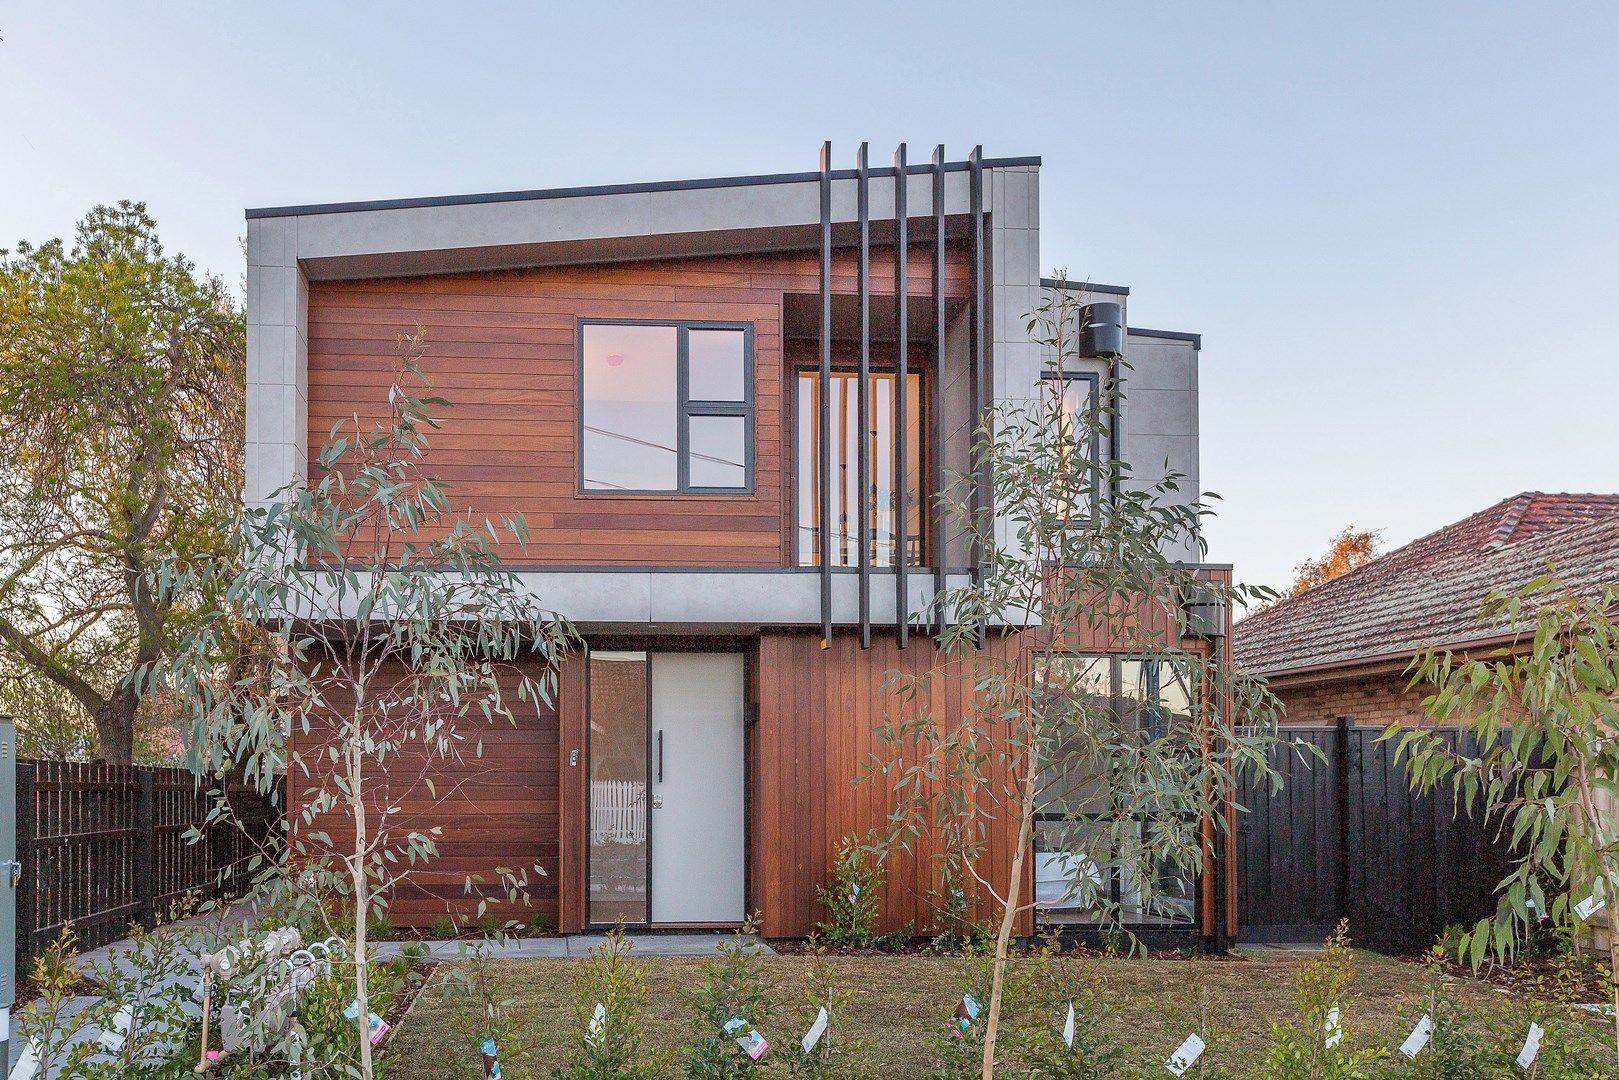 1/672 Barkly Street, West Footscray VIC 3012, Image 0